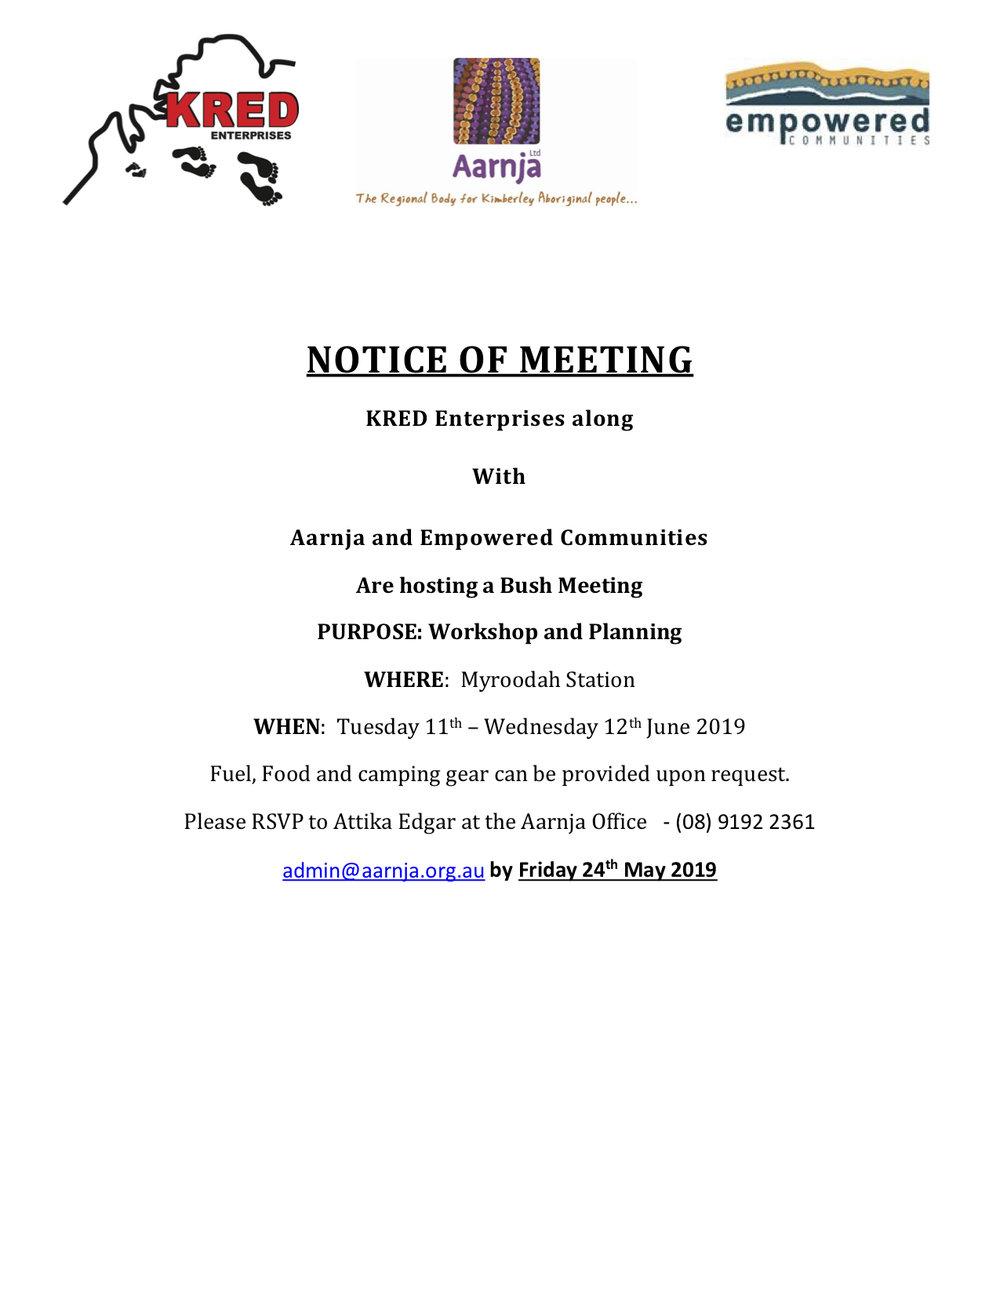 KRED & Aarnja Bush Meeting - Invitaiton - Aarnja Members.jpg